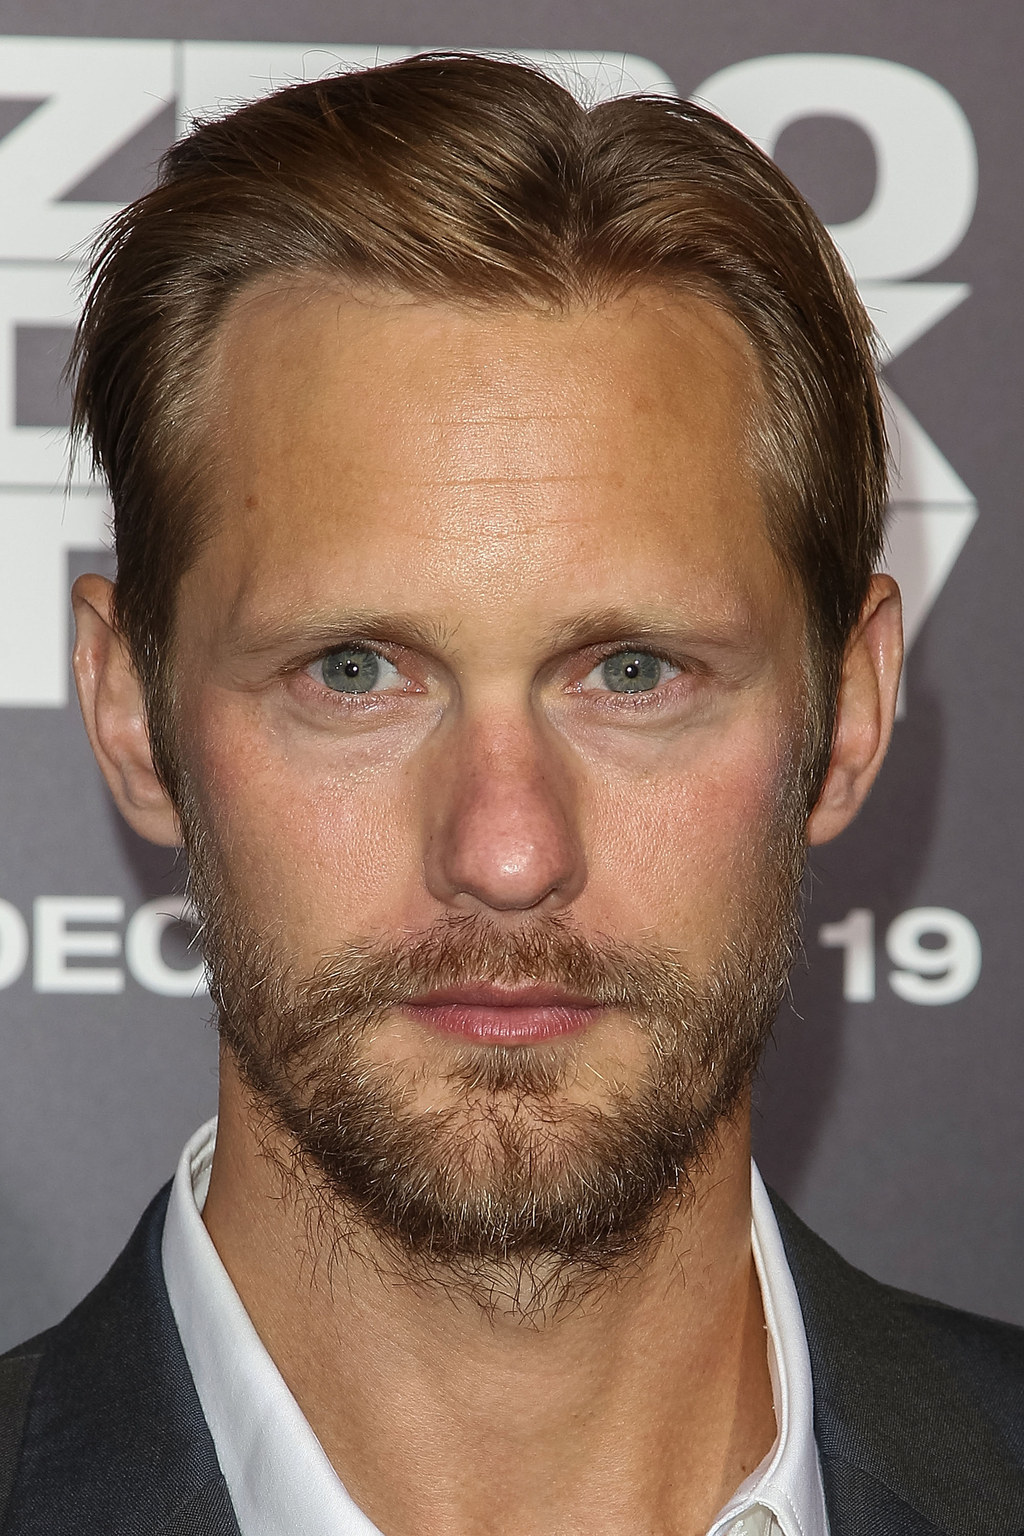 typical swedish man image